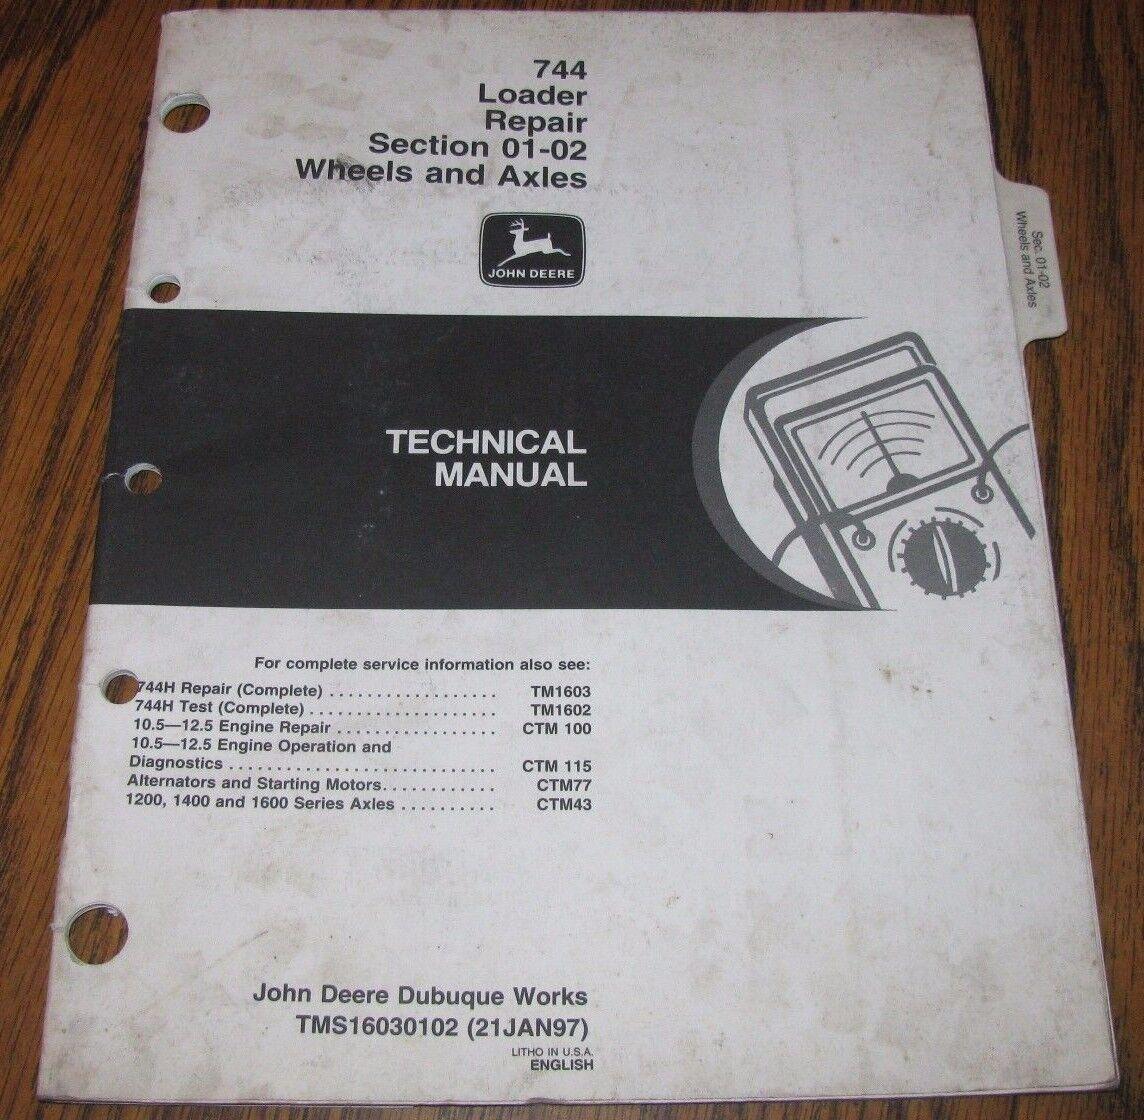 John Deere 744 Wheel Loader Wheels Axles Technical Repair Service Manual  TM1603